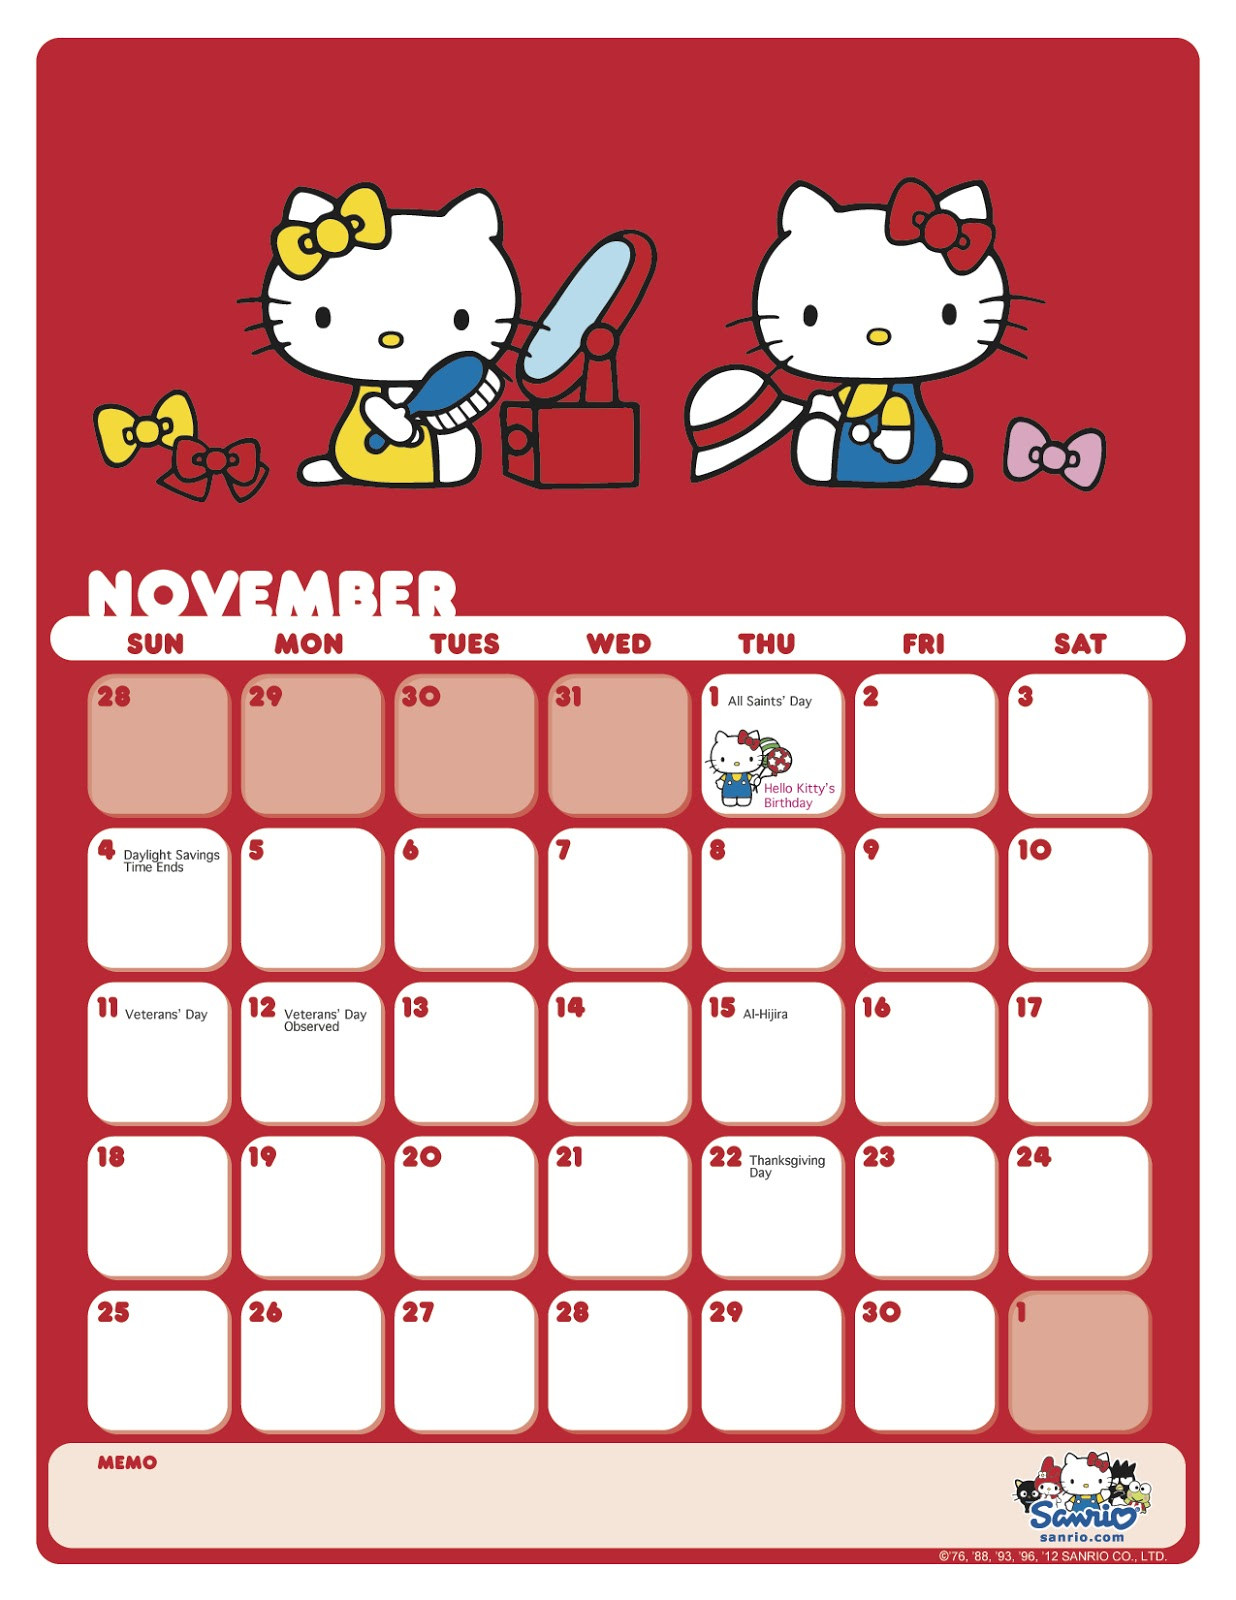 I Love Kawaii Sanrio November 2012 Calendar